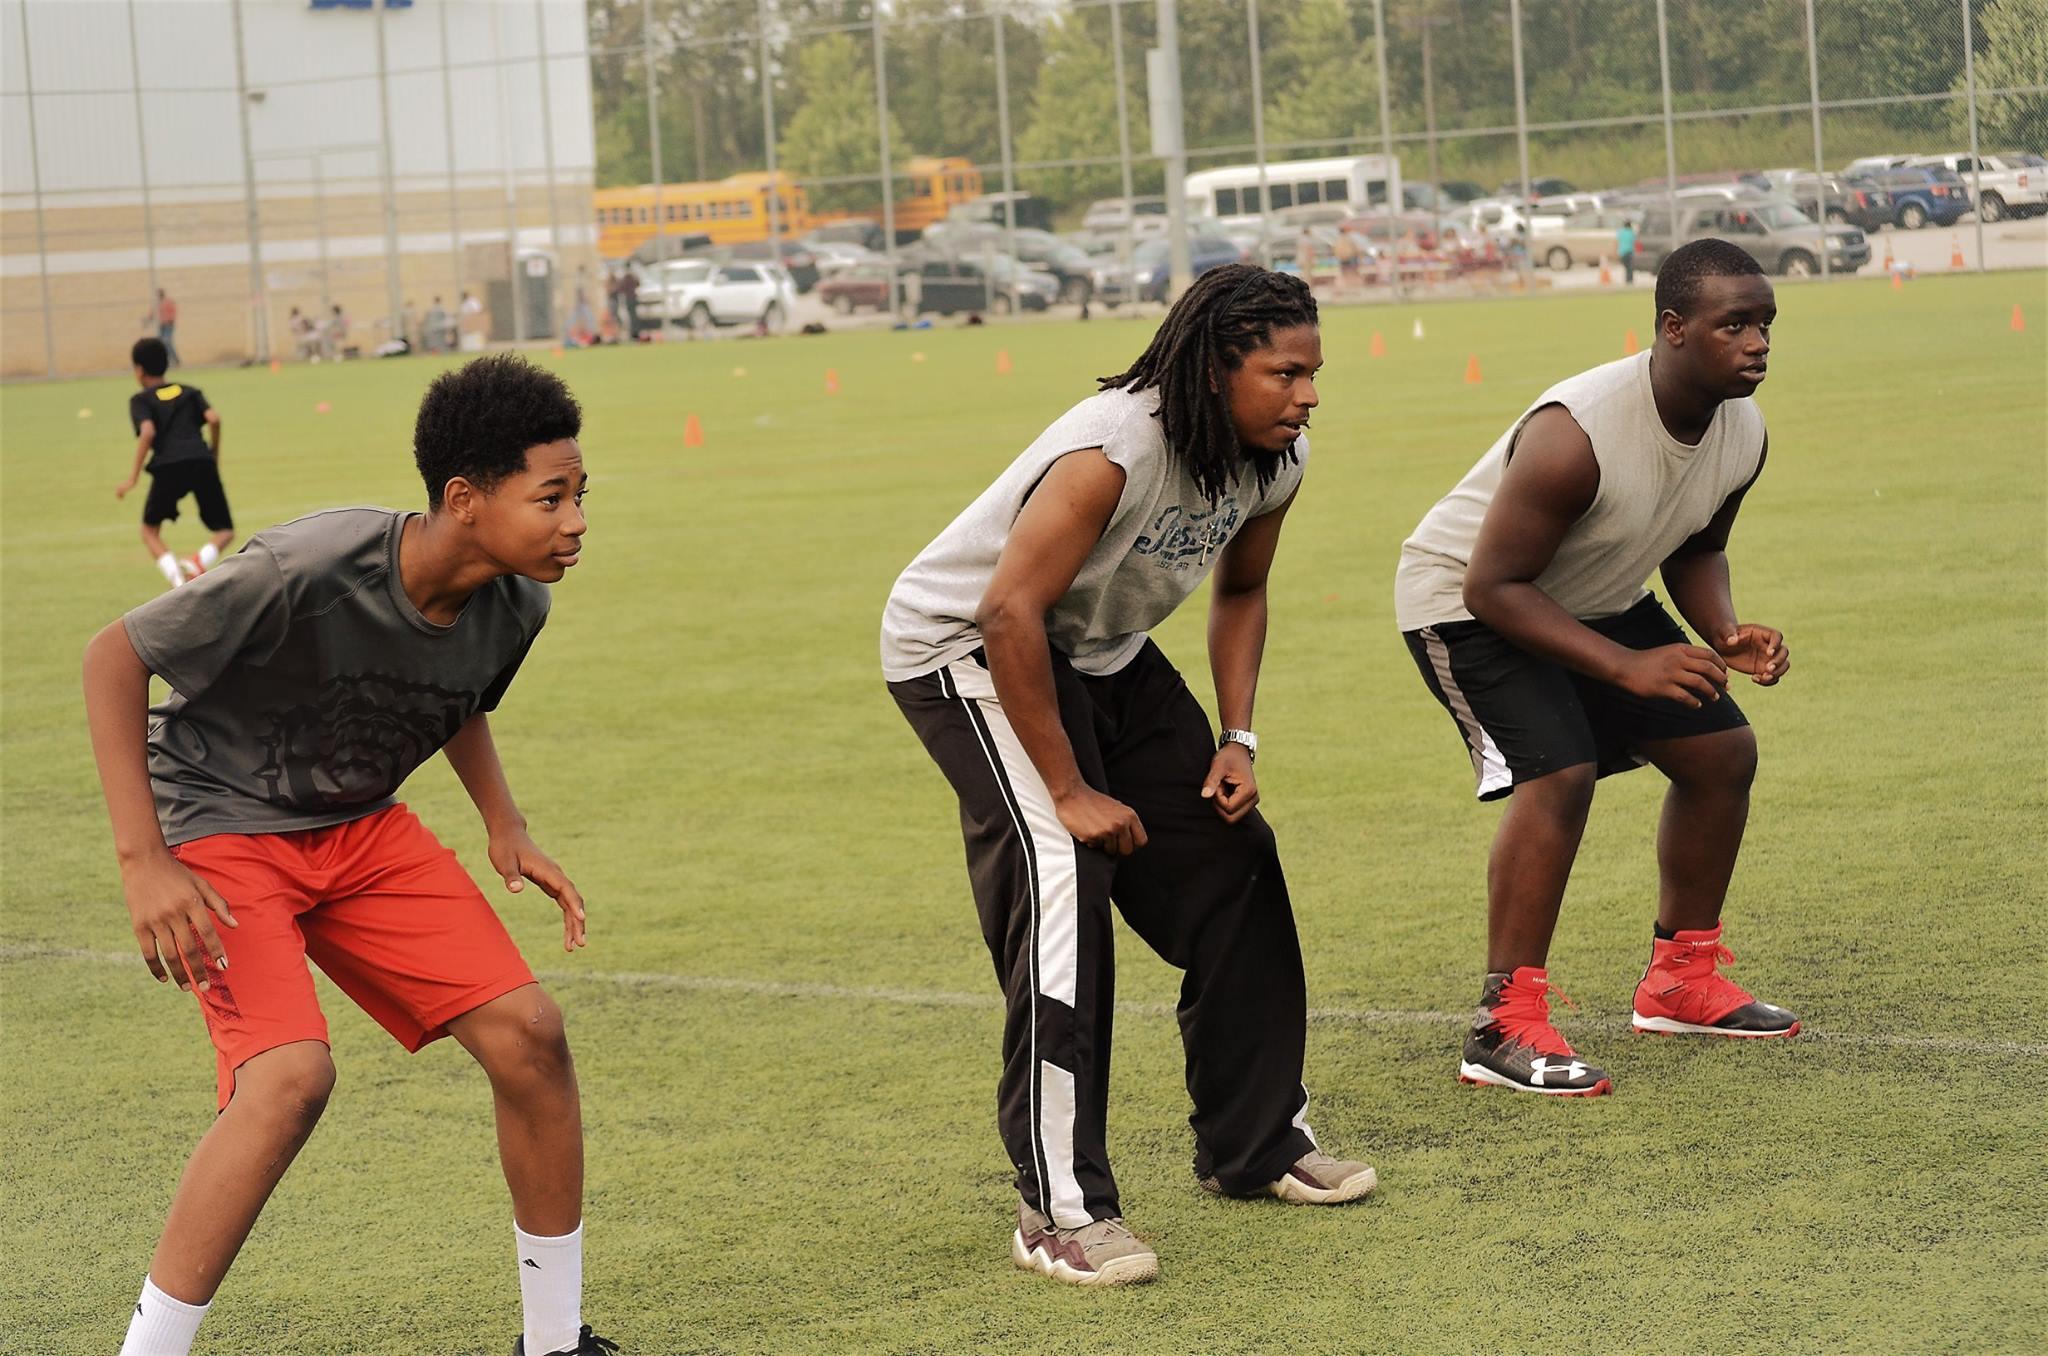 coaching football drills